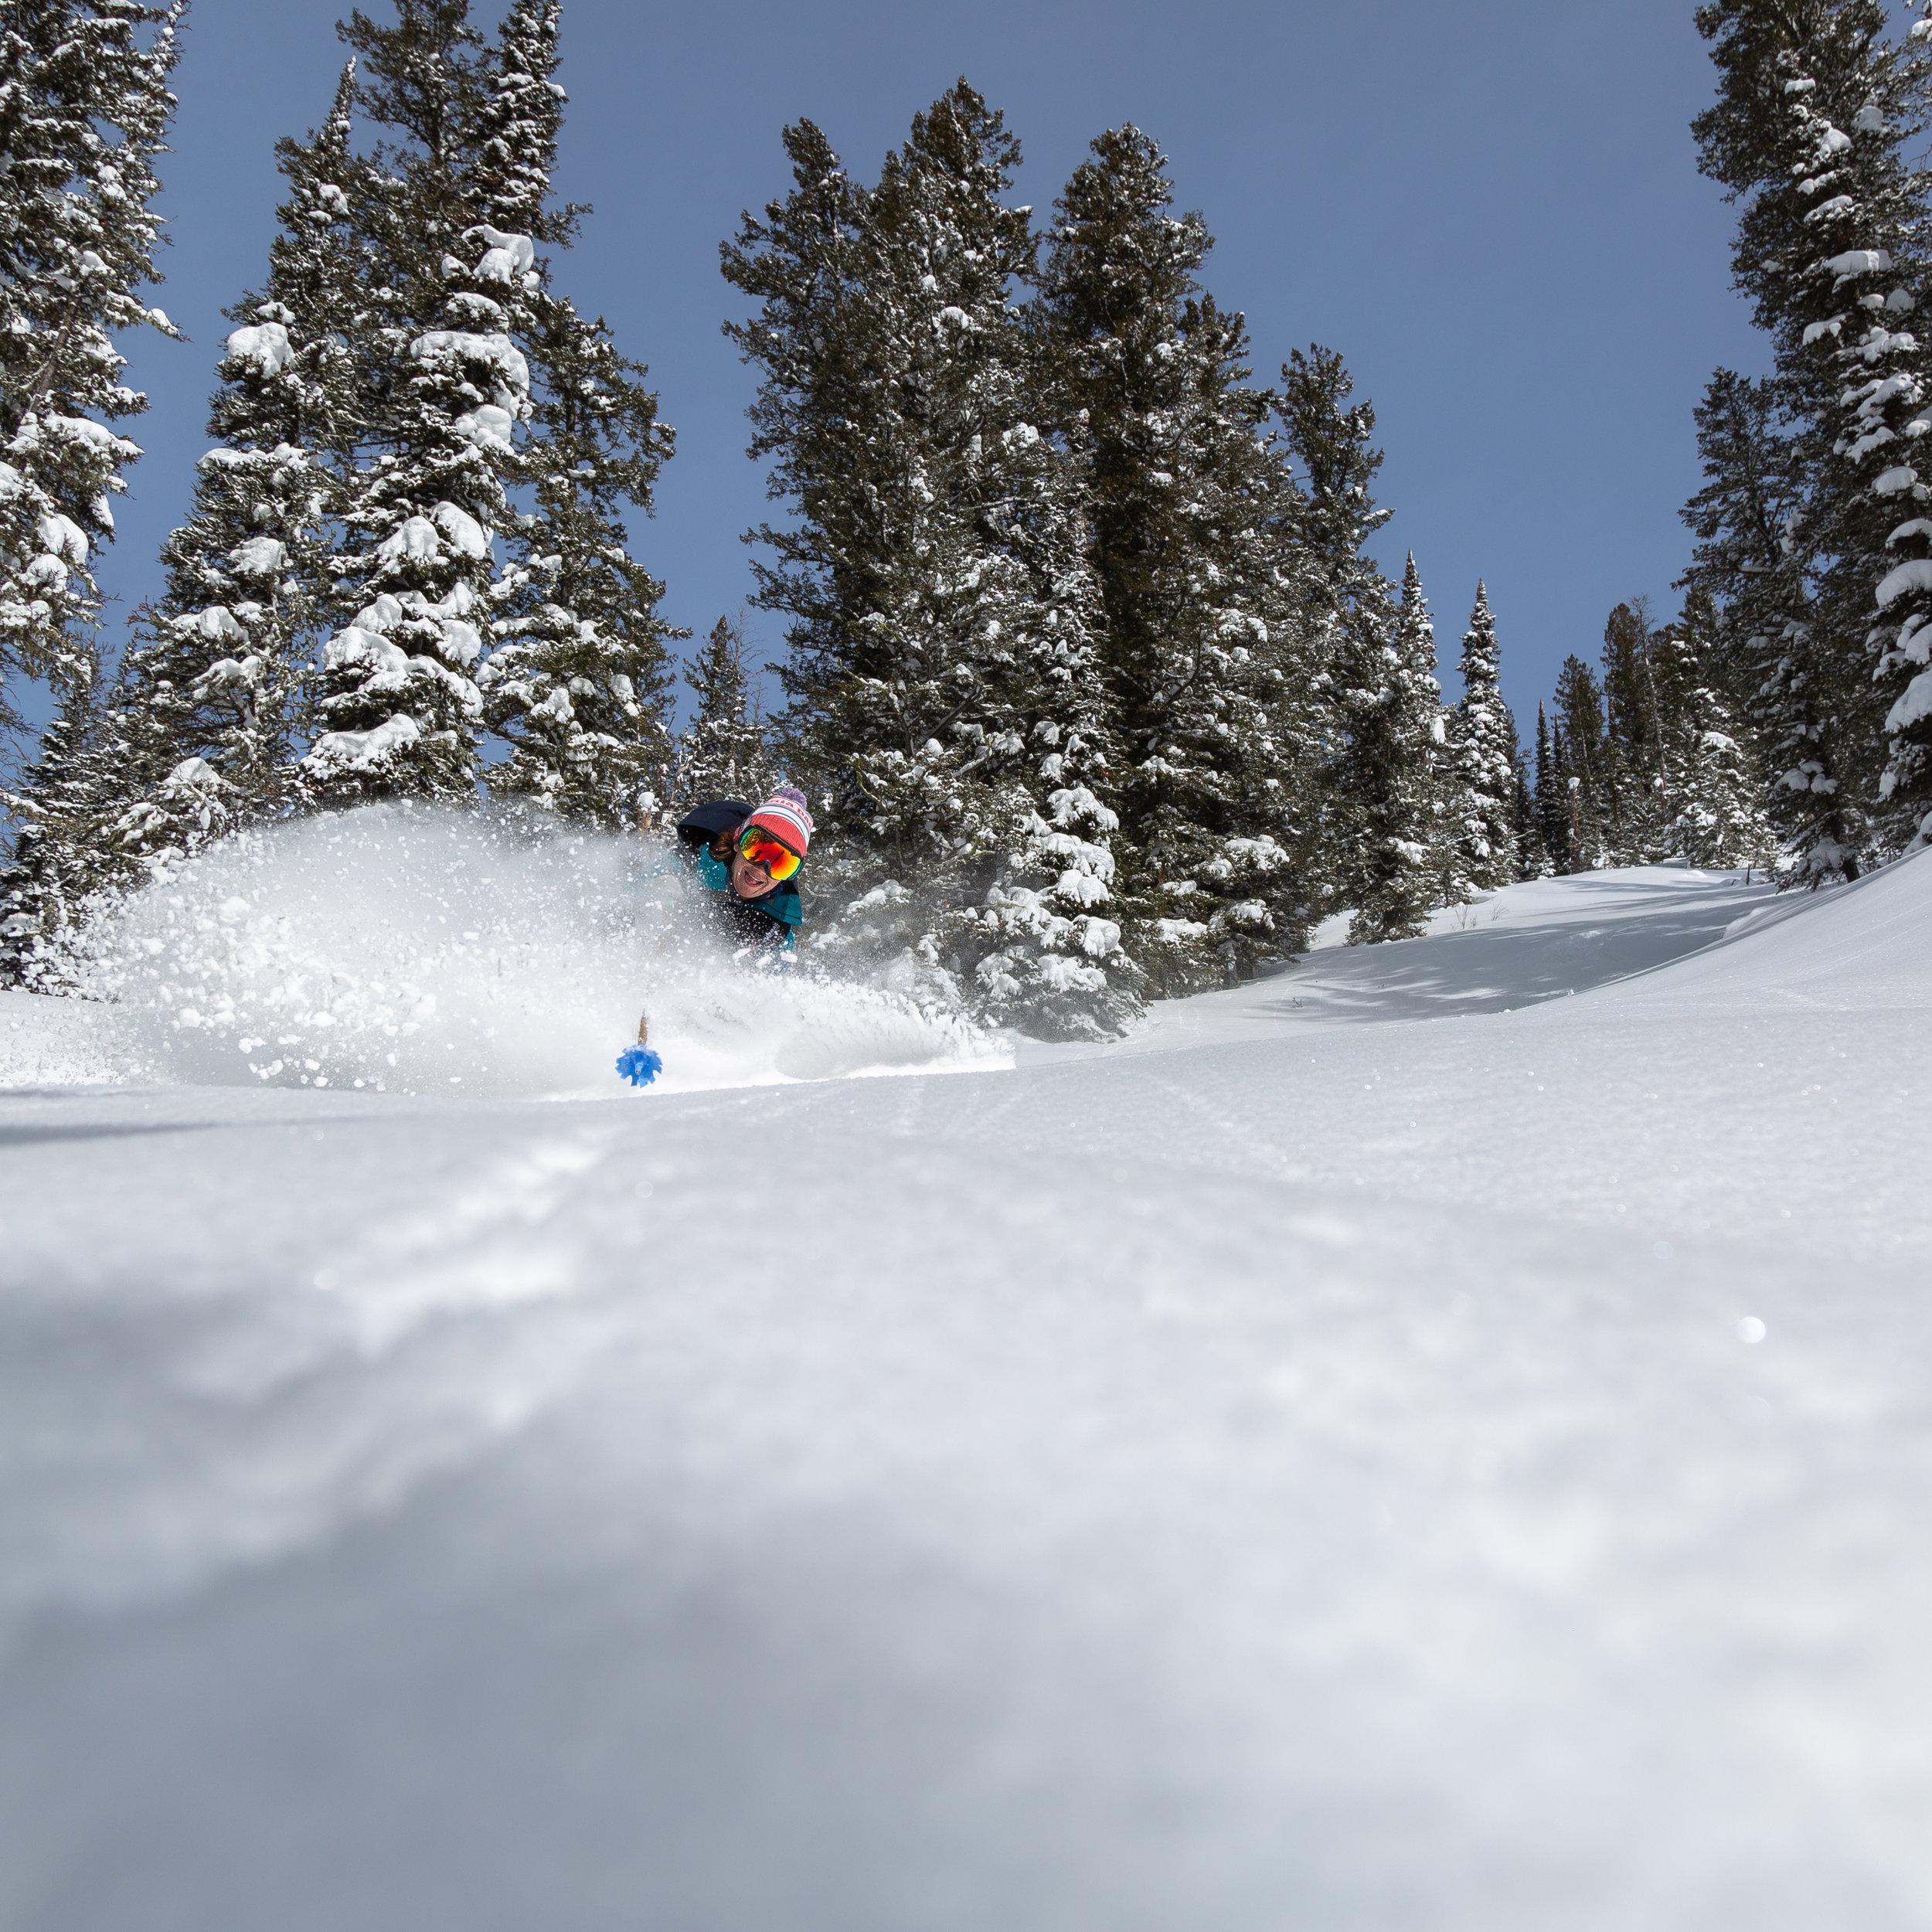 JTG_Skiing-1.jpg